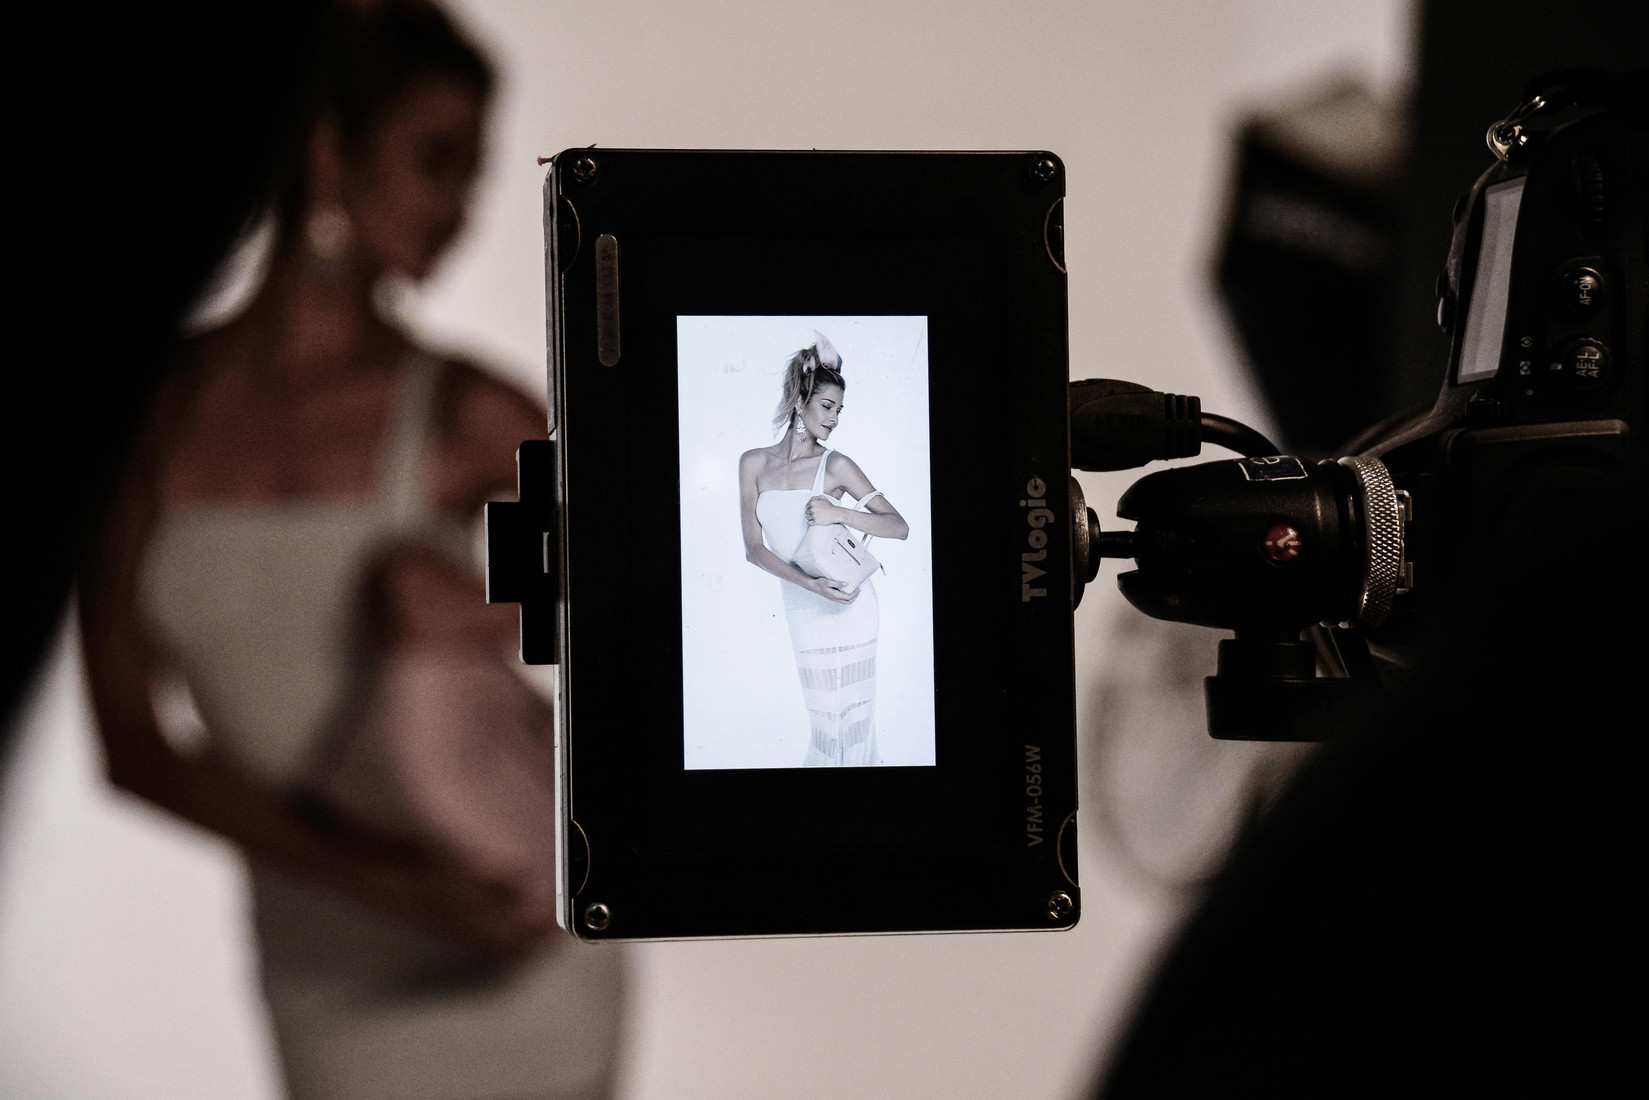 Contate Marcelo Paez- Fotógrafo de moda e produto